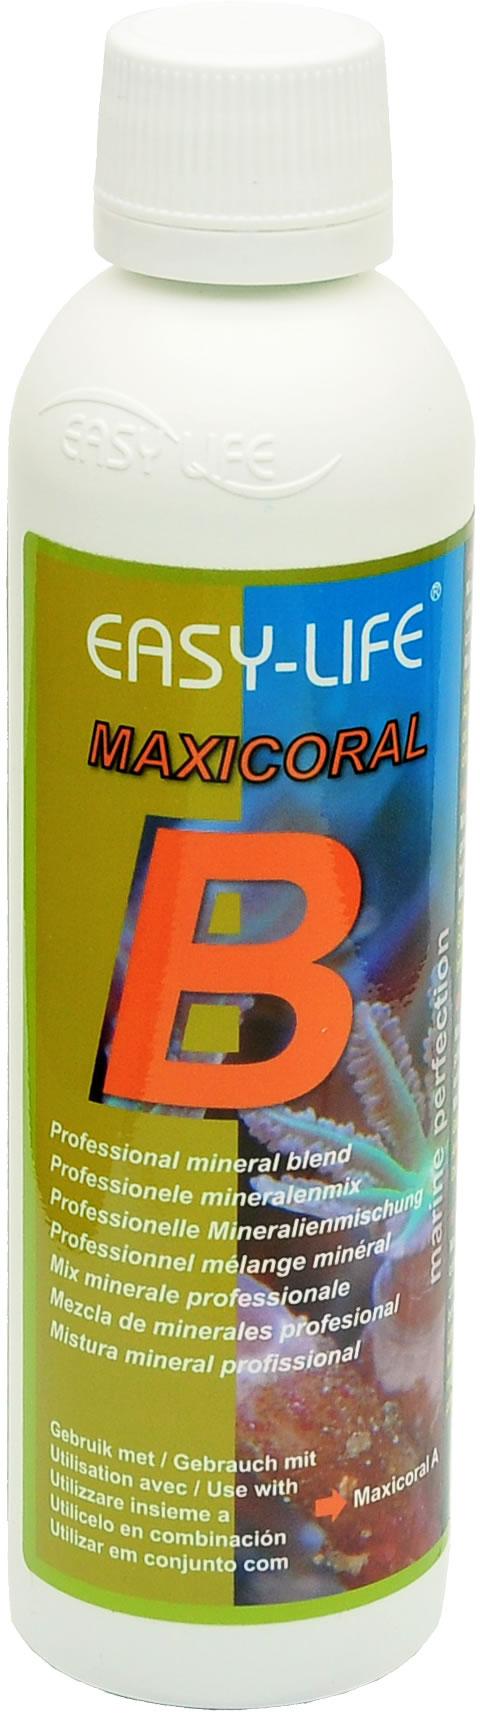 Easy Life Maxicoral B